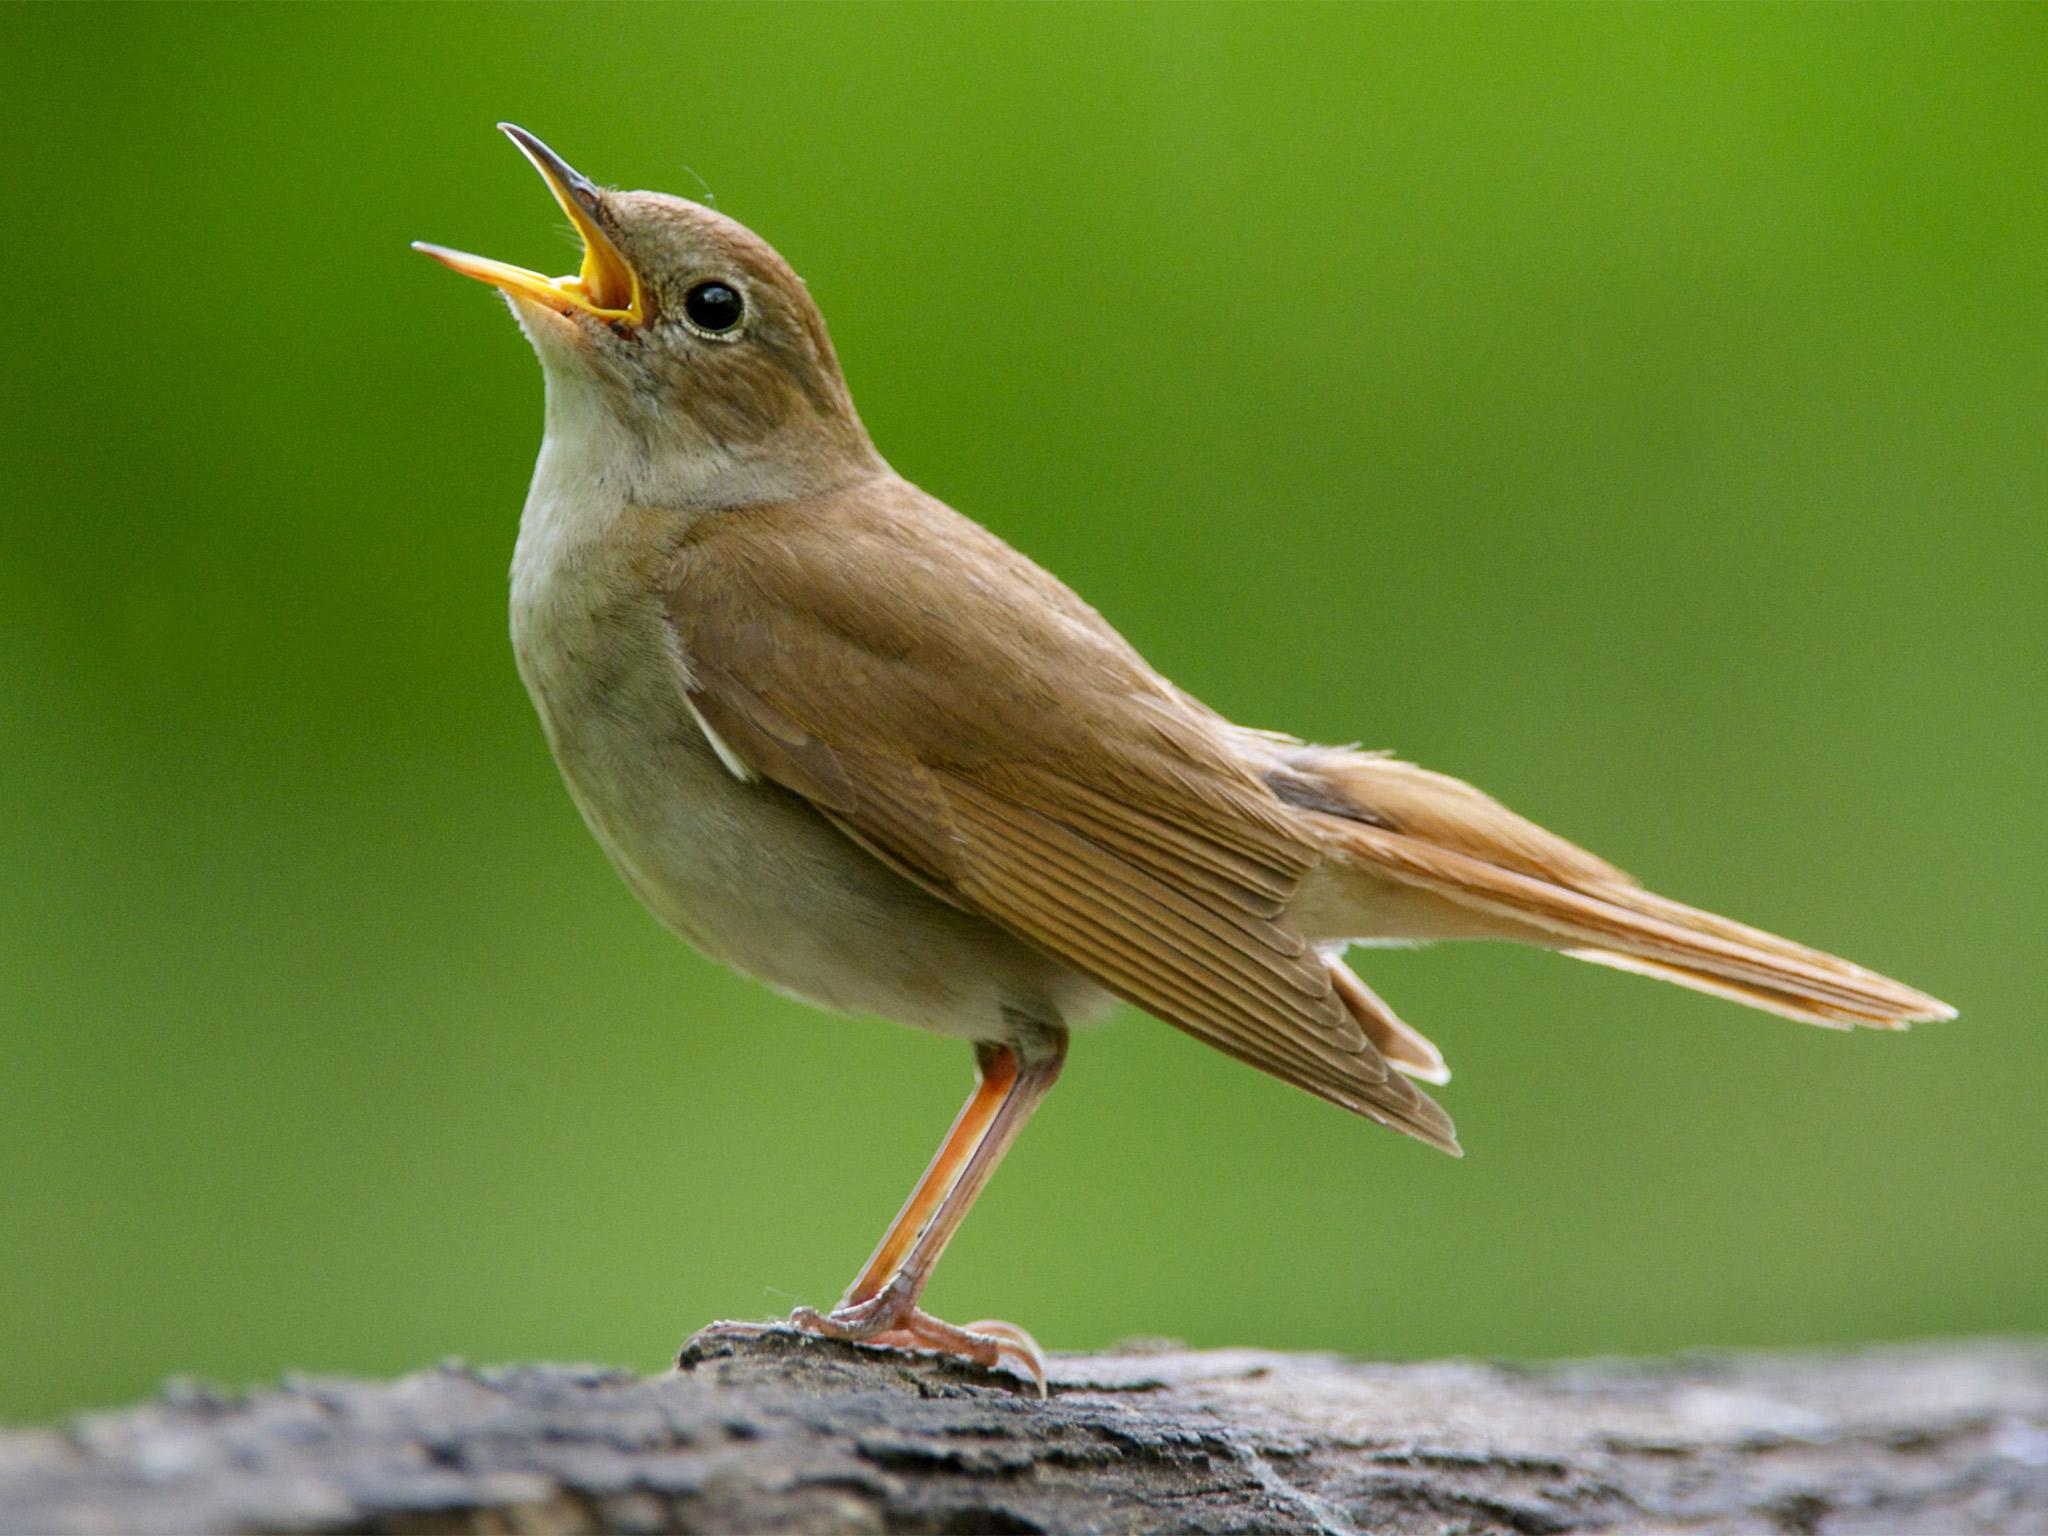 Nightingale : National Bird Of Iran | Interesting Facts